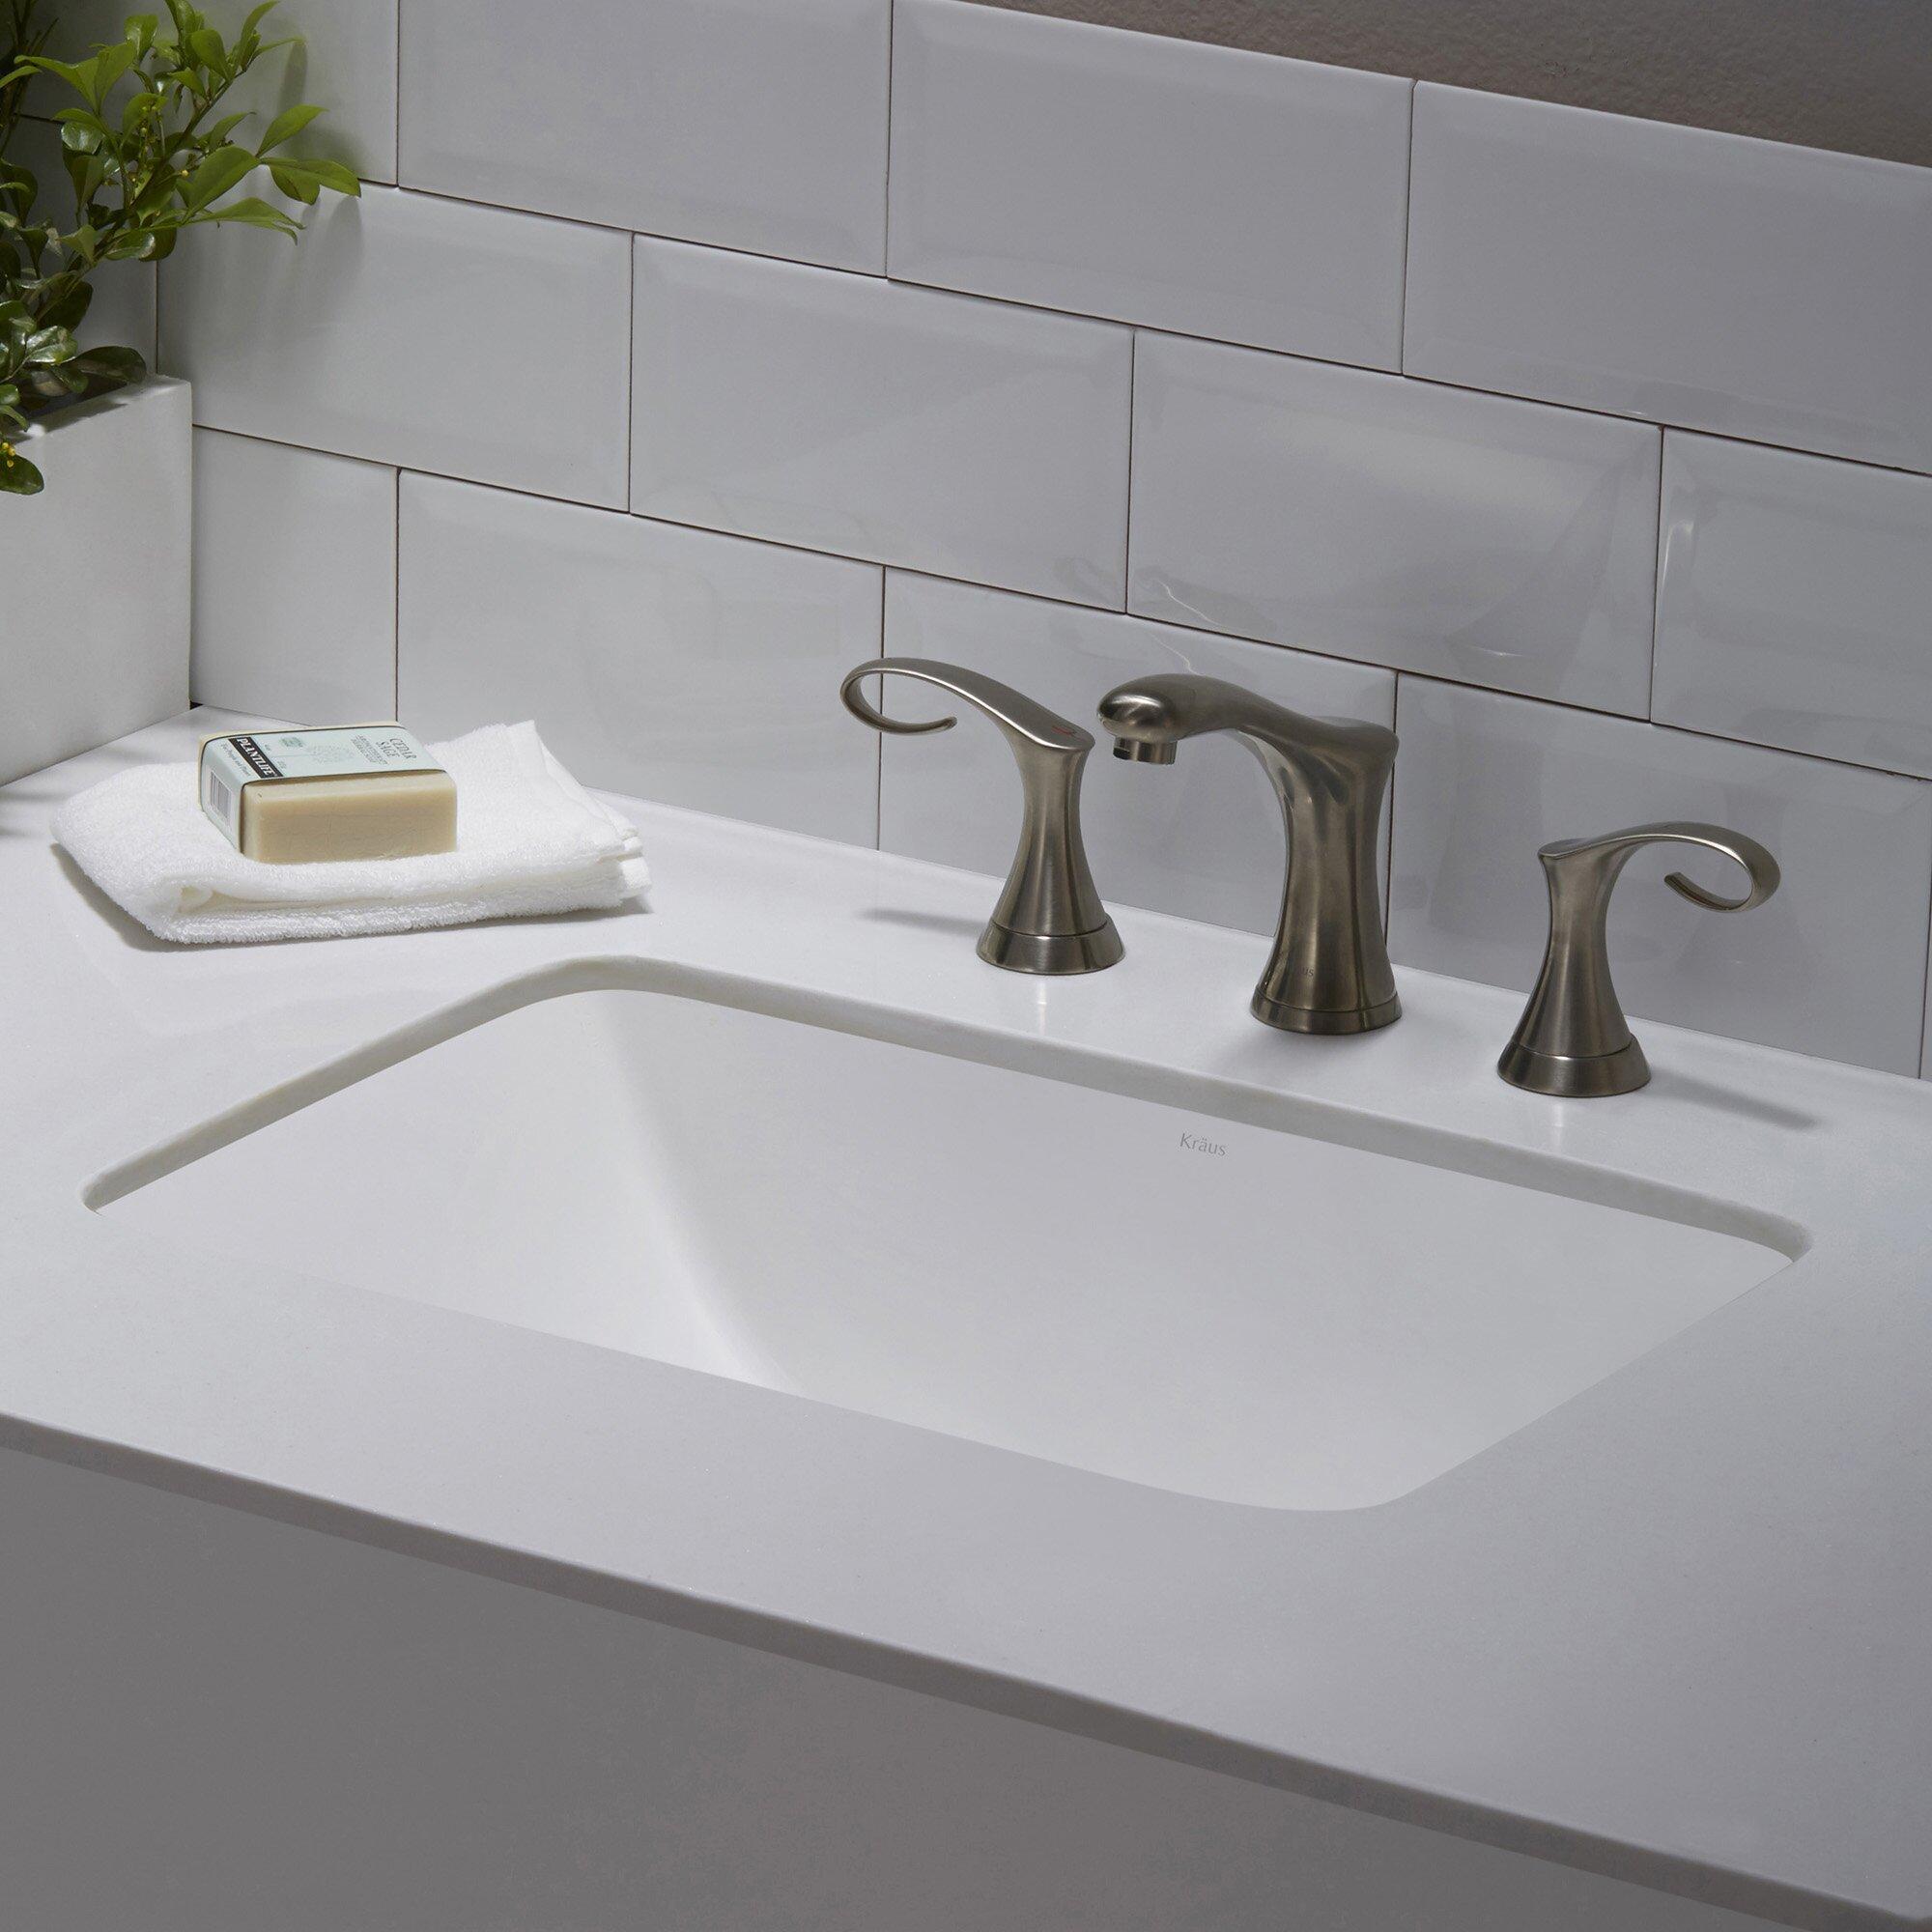 Undermount Bathroom Sink Rectangular Undermount Bathroom Sink